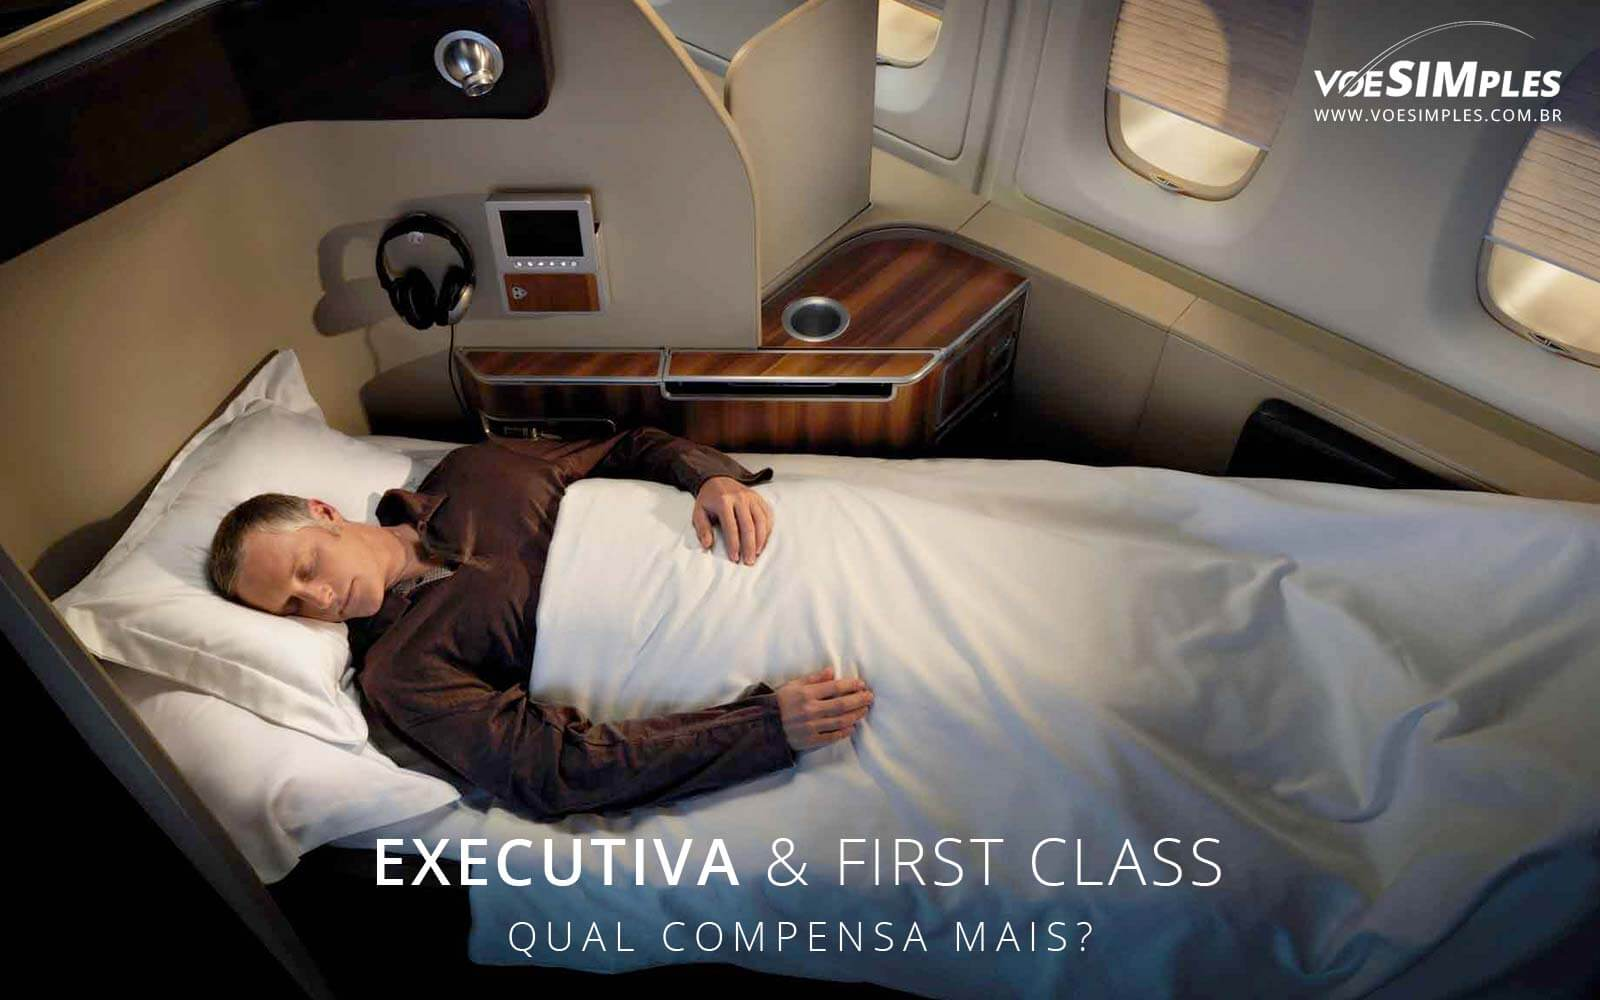 passagens-aereas-executiva-baratas-multi-destinos-pais-continente-voe-simples-passages-aereas-promocionais-executivas-pais-passagem-promo-executiva-multi-destinos